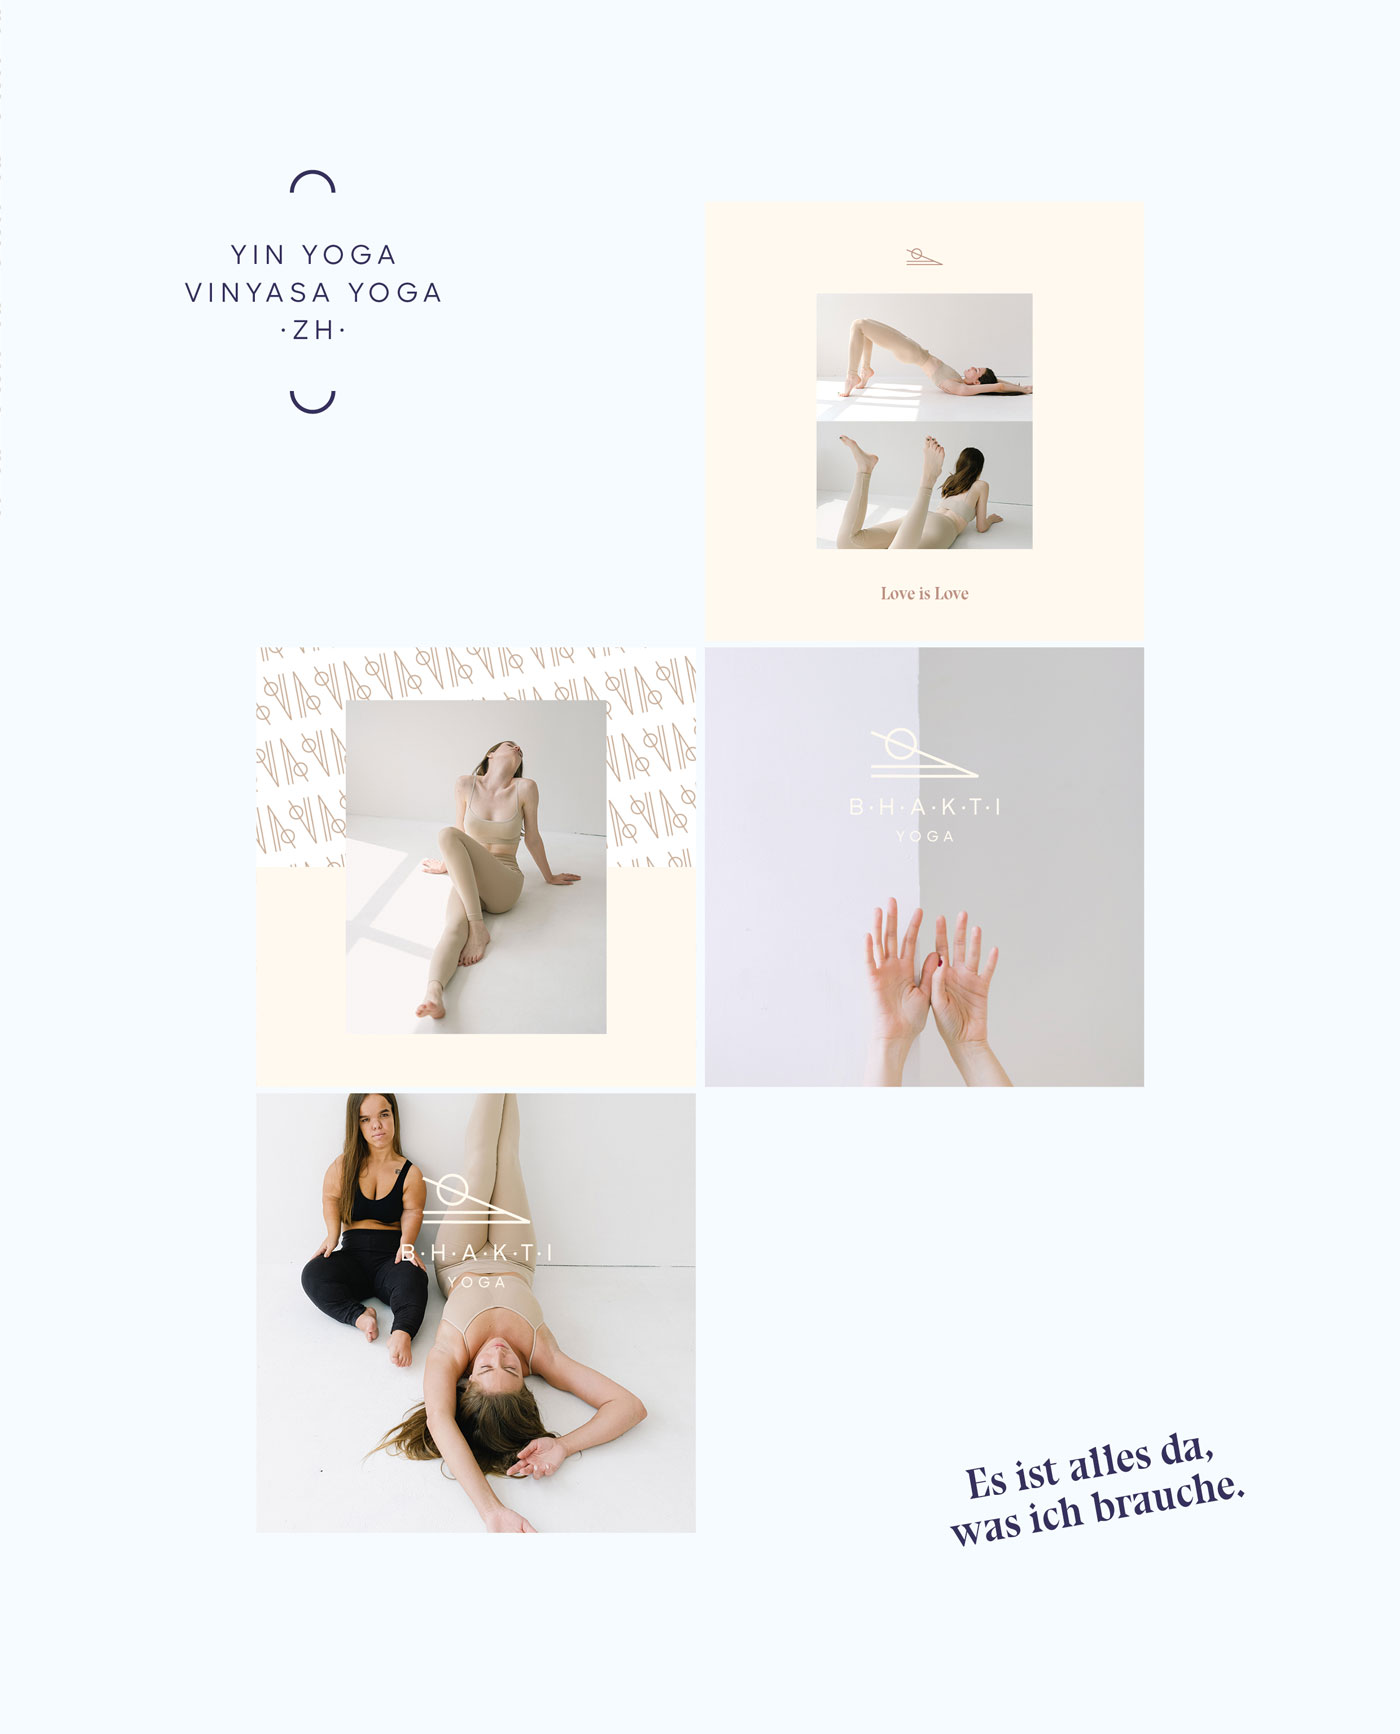 Bhakti Yoga Instagram Templates by Mindt